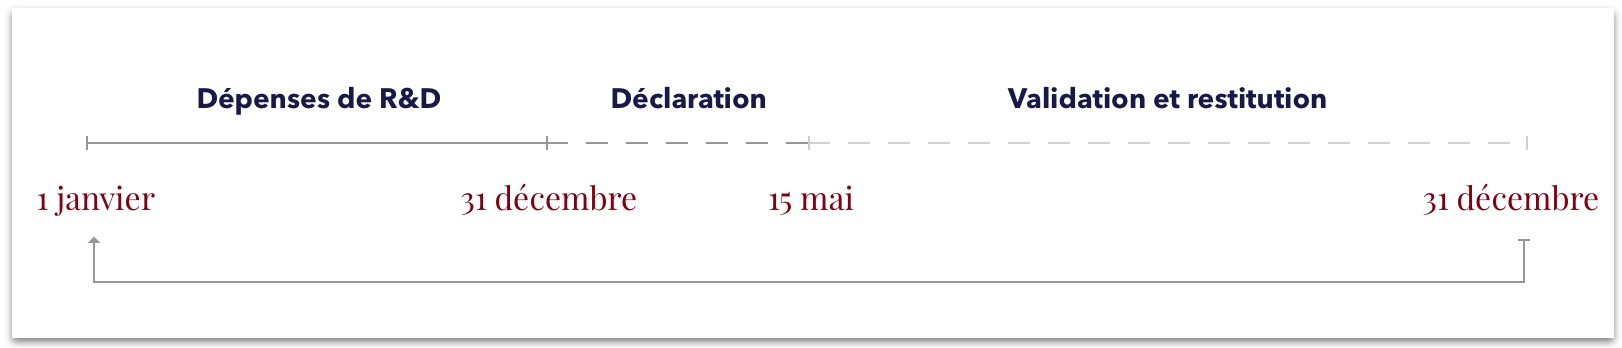 calendrier de déclaration CIR